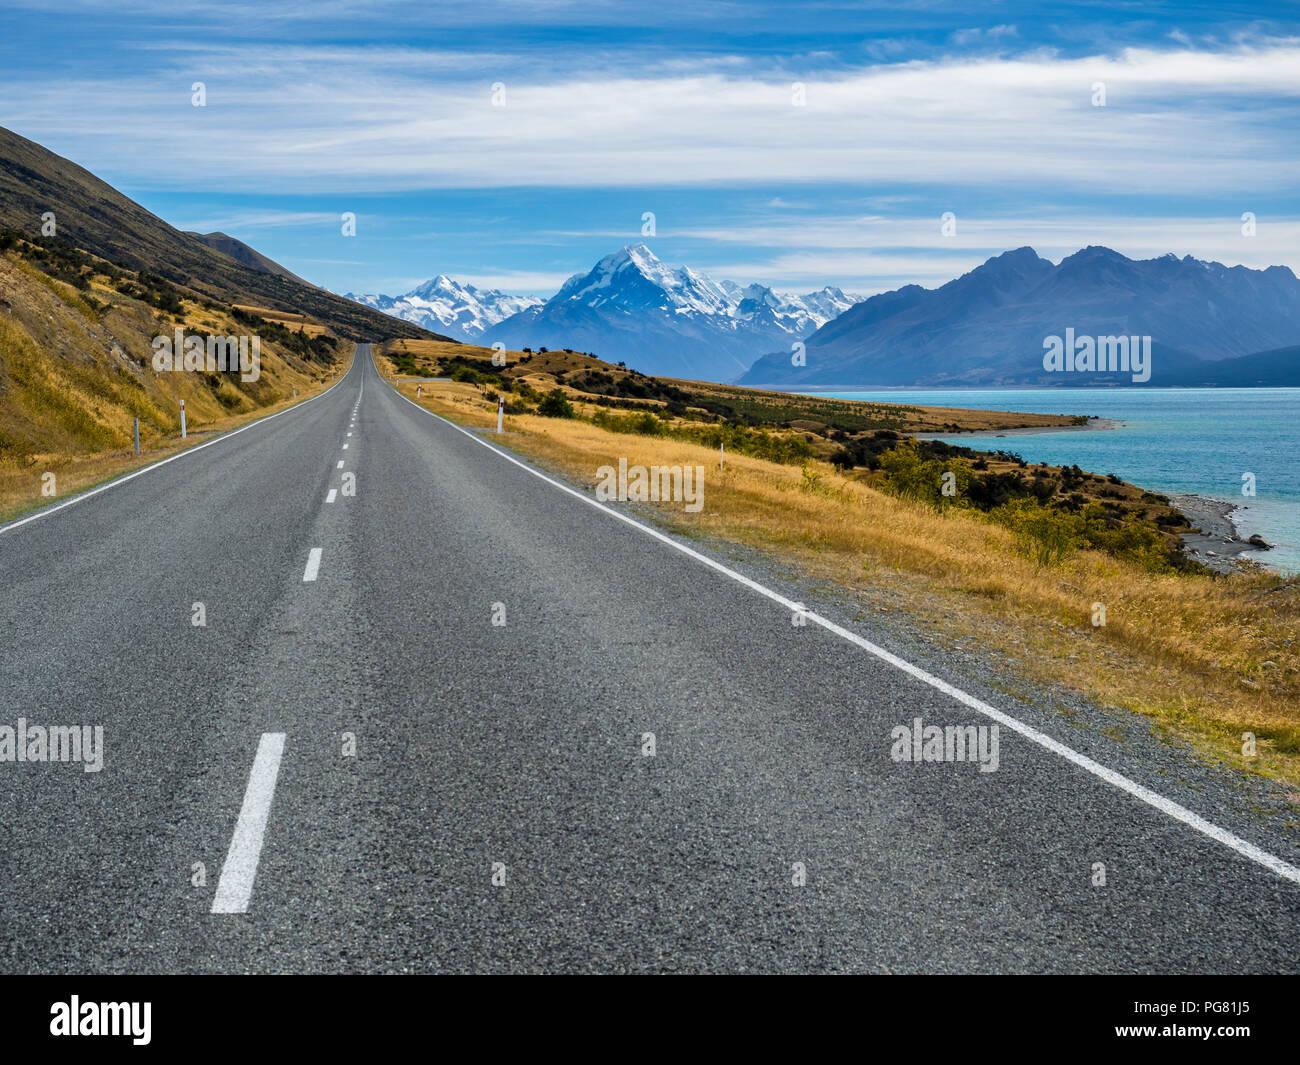 Neuseeland, Südinsel, leere Straße mit Aoraki Mount Cook und Lake Pukaki im Hintergrund Stockfoto